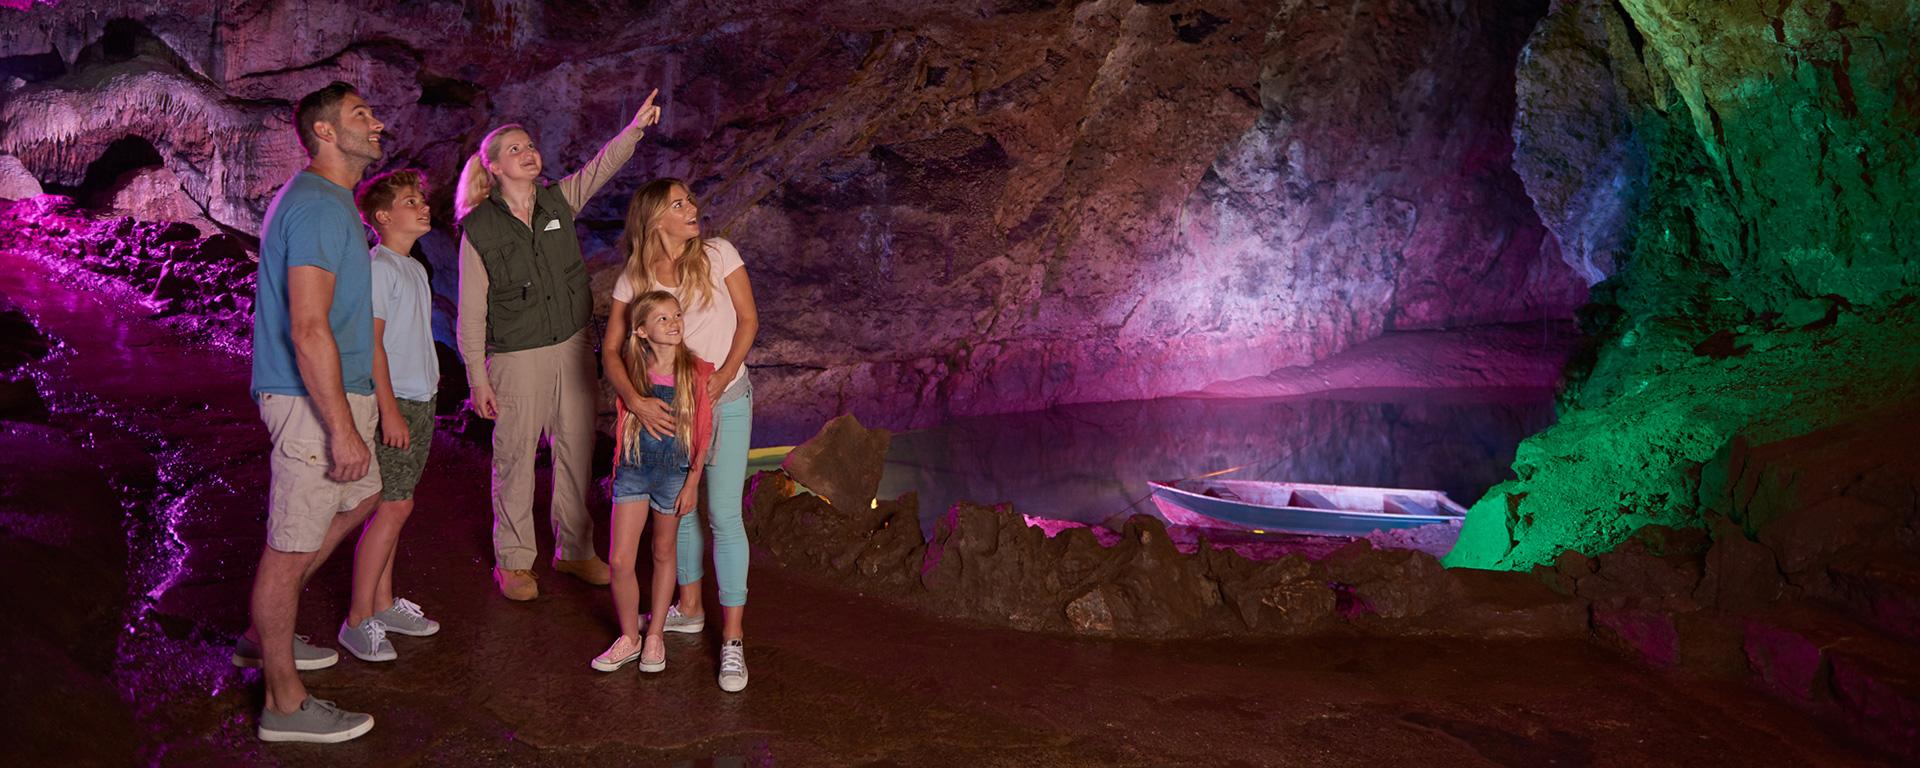 Wookey Hole Caves - Somerset, England